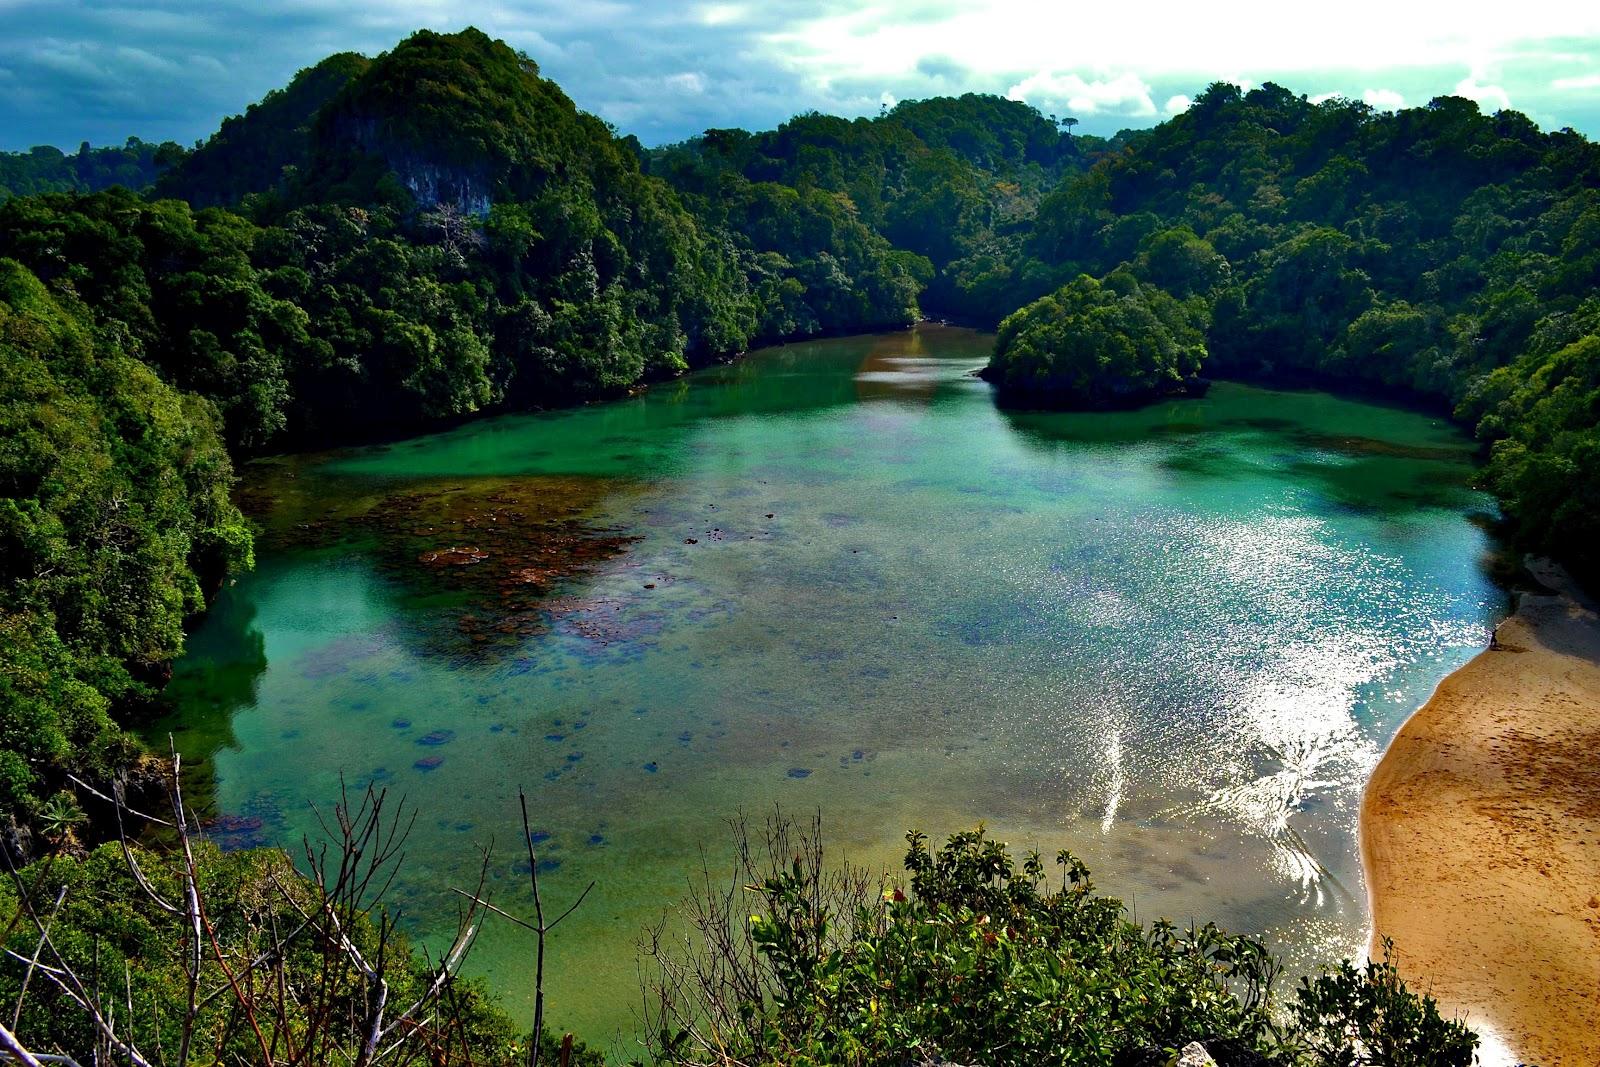 23 Destinasi Wisata Malang Sekitarnya Wajib Kamu Singgahi Kecantikan Segara